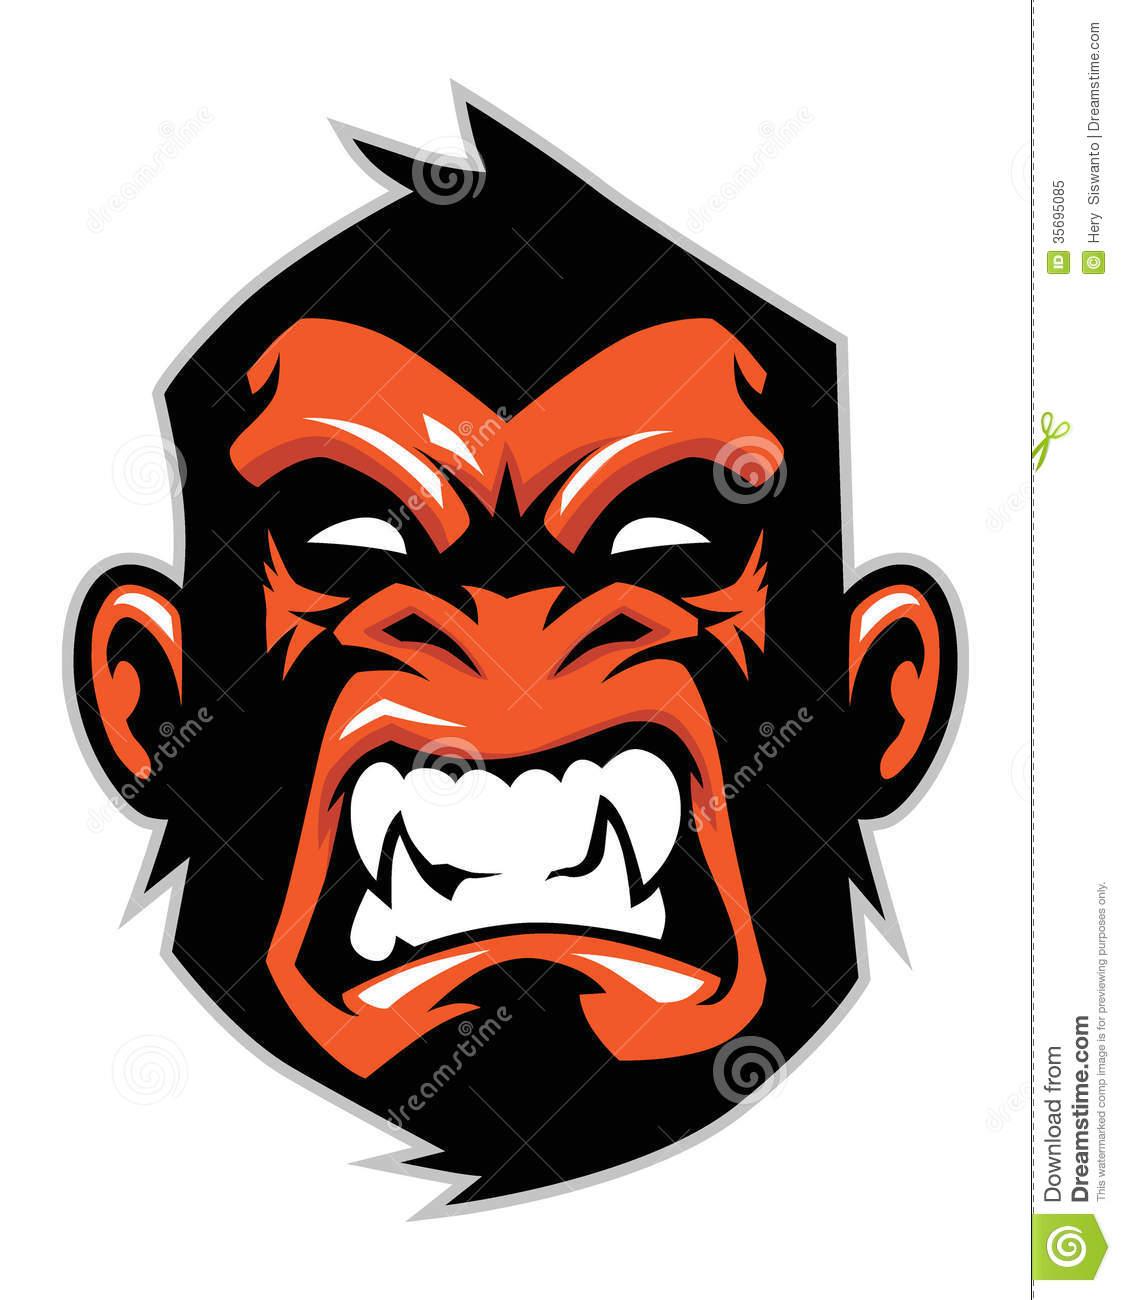 Monkey head drawing at. Bigfoot clipart angry ape